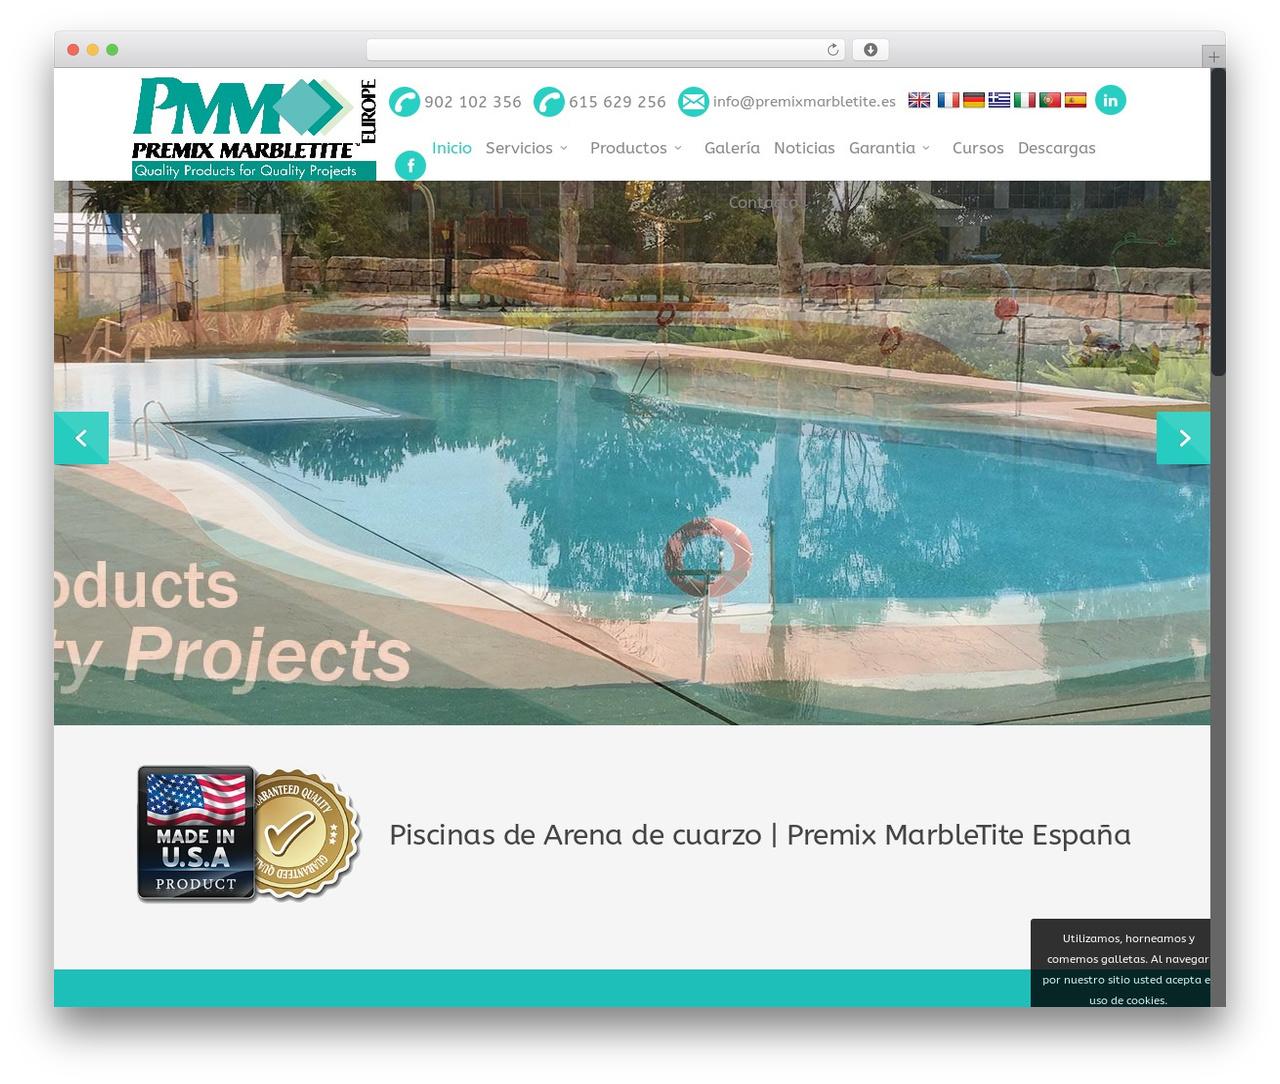 WP theme Salient - piscinasarenacuarzo.es